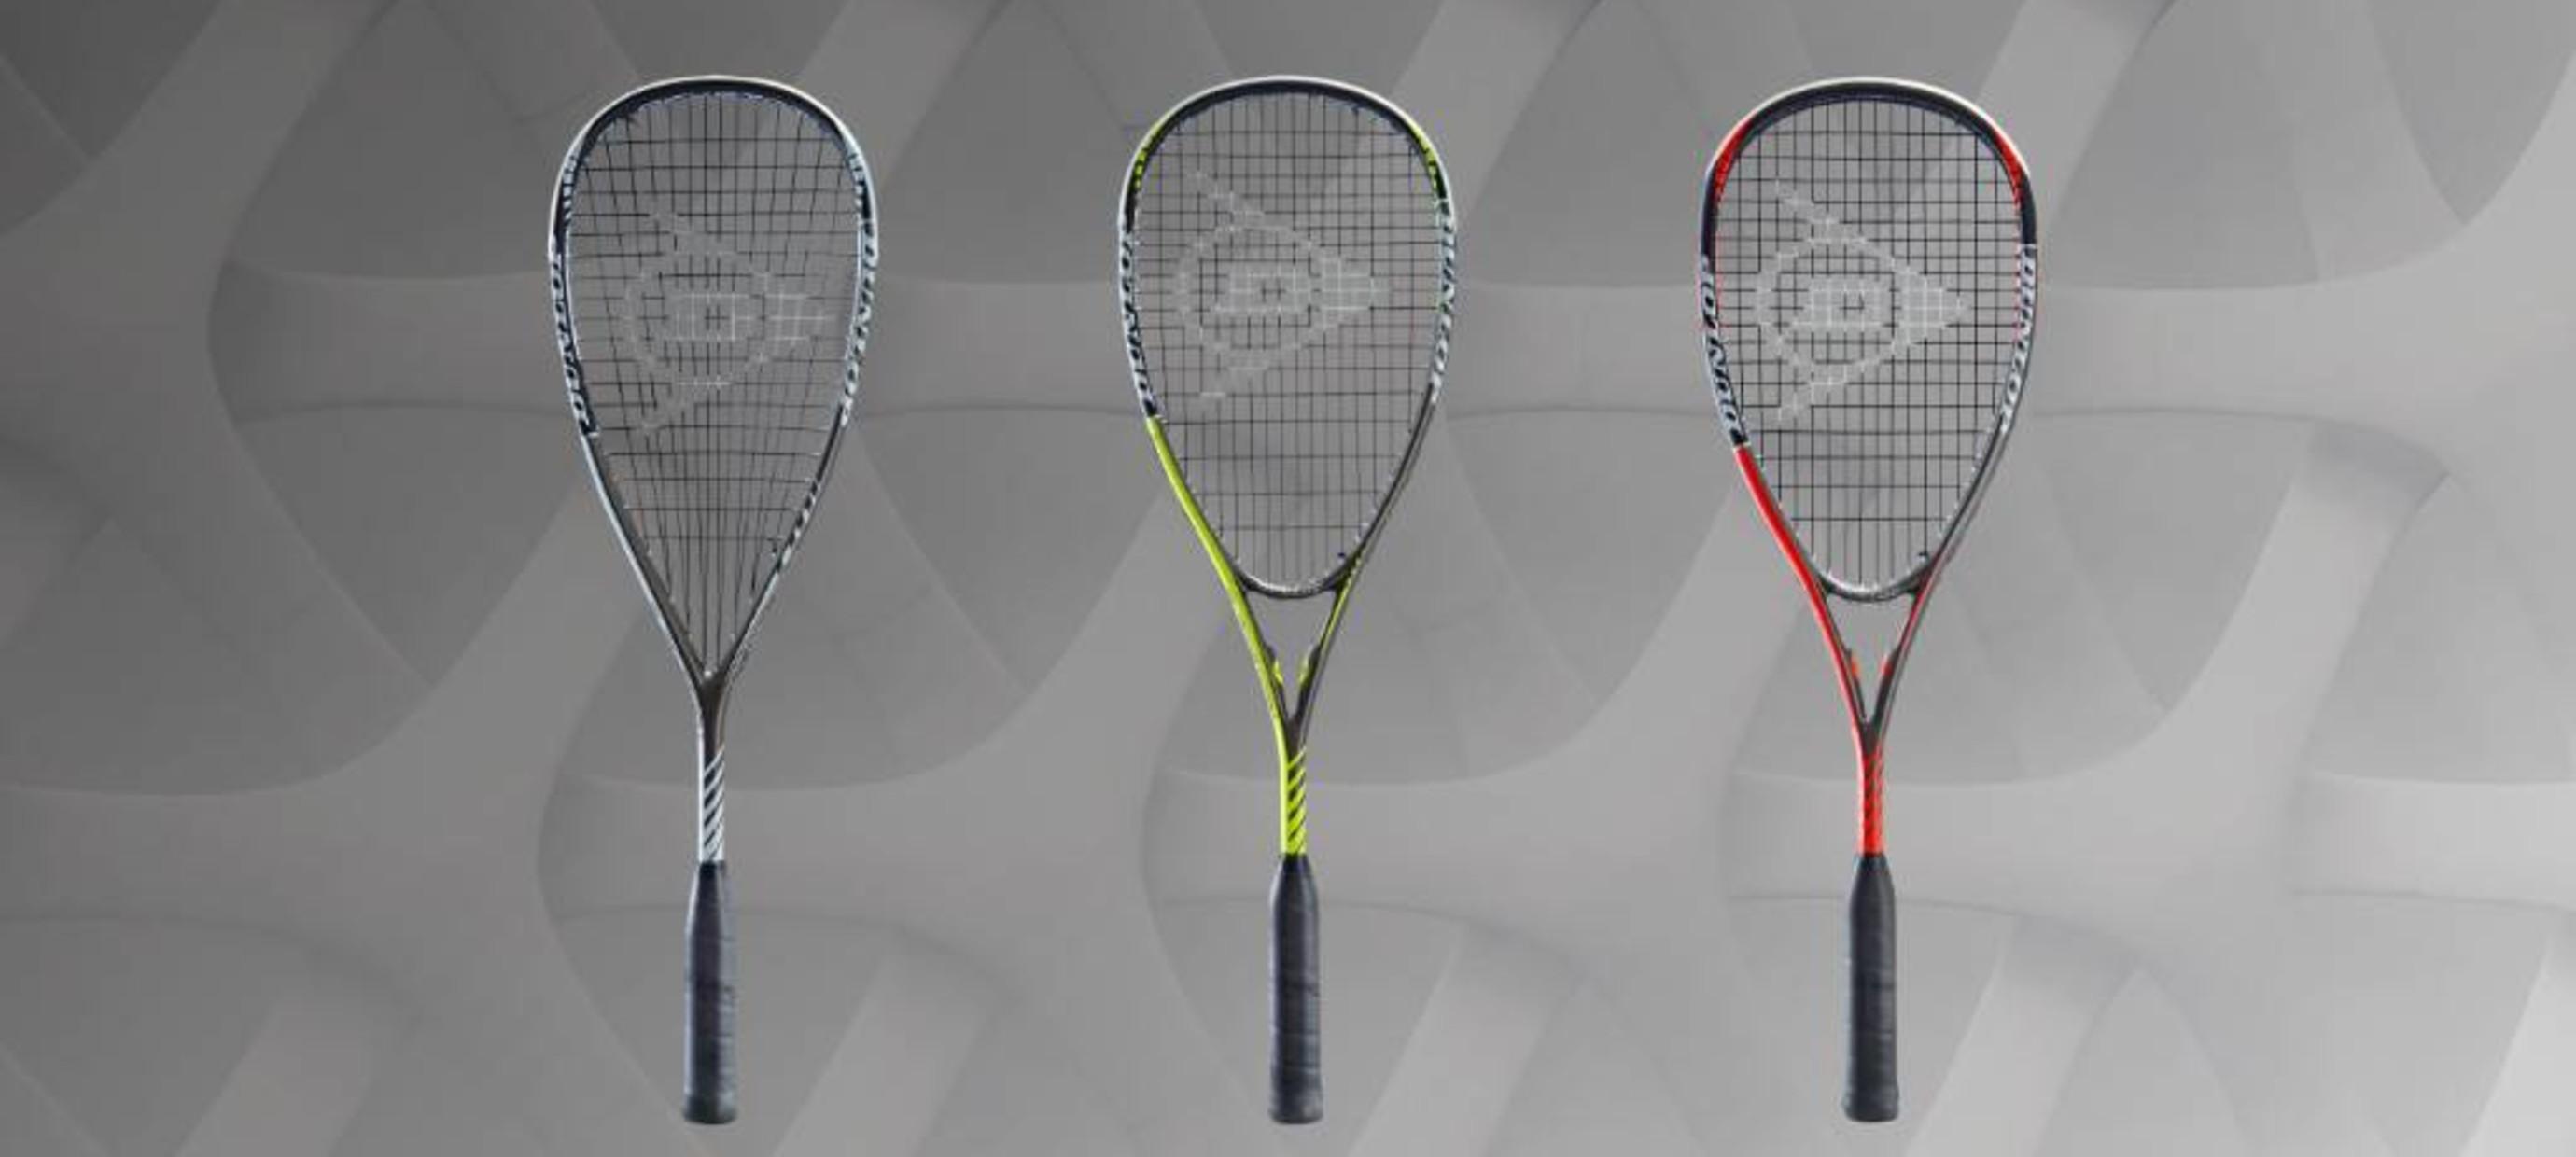 Review of Dunlop Blackstorm 3.0 Squash Rackets